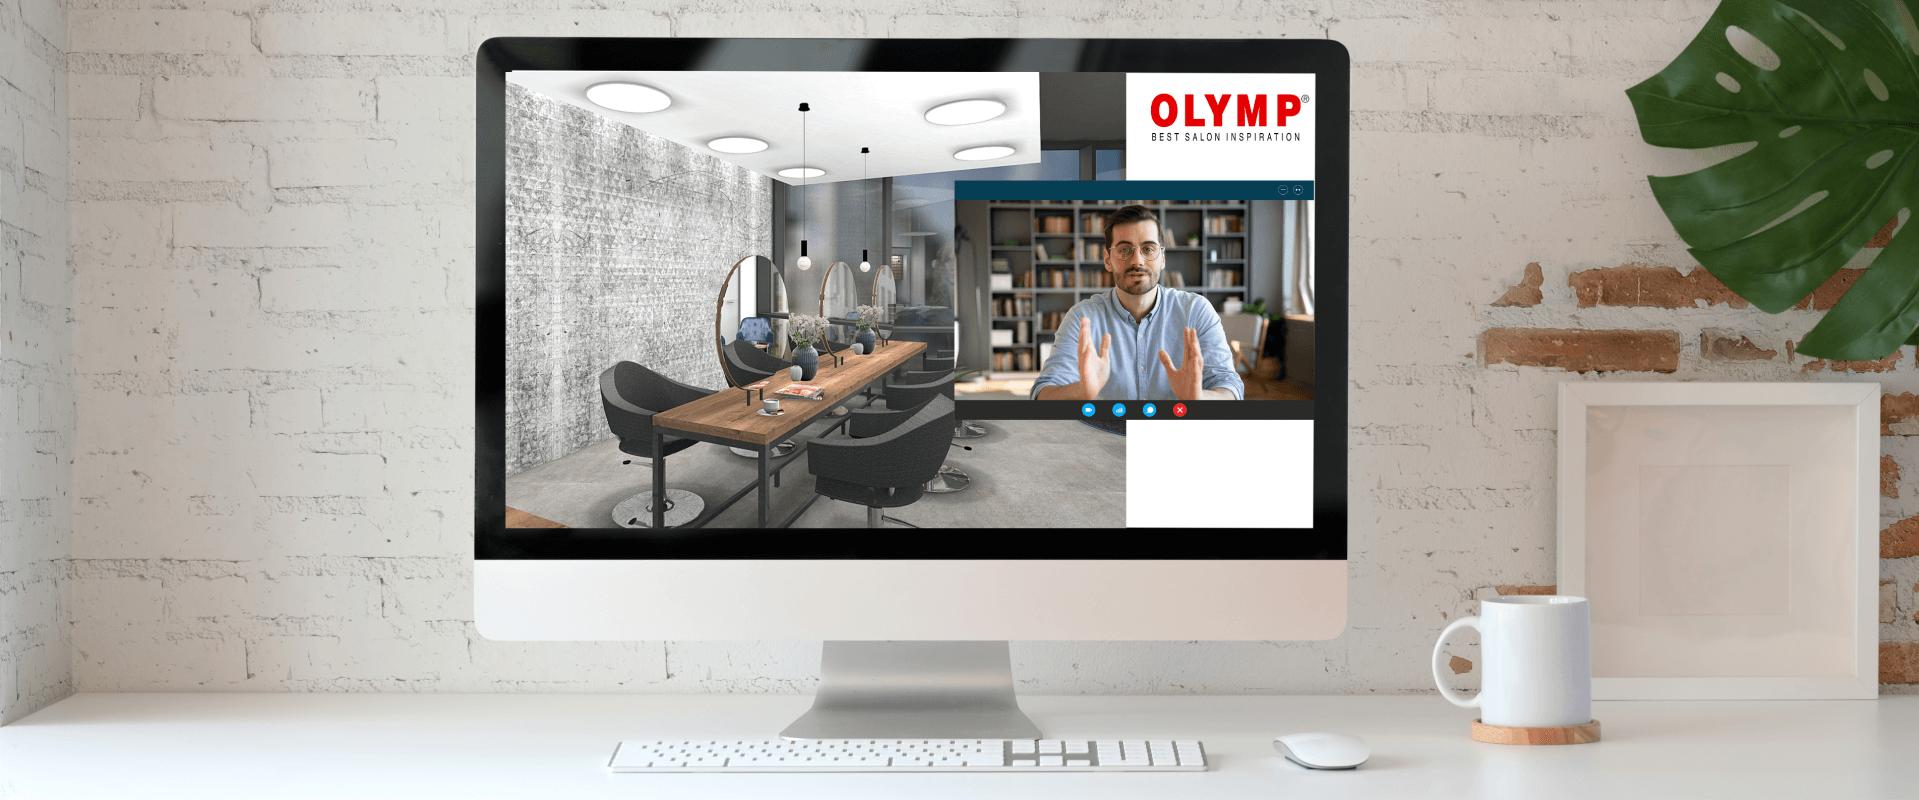 OLYMP - Onlineberatung